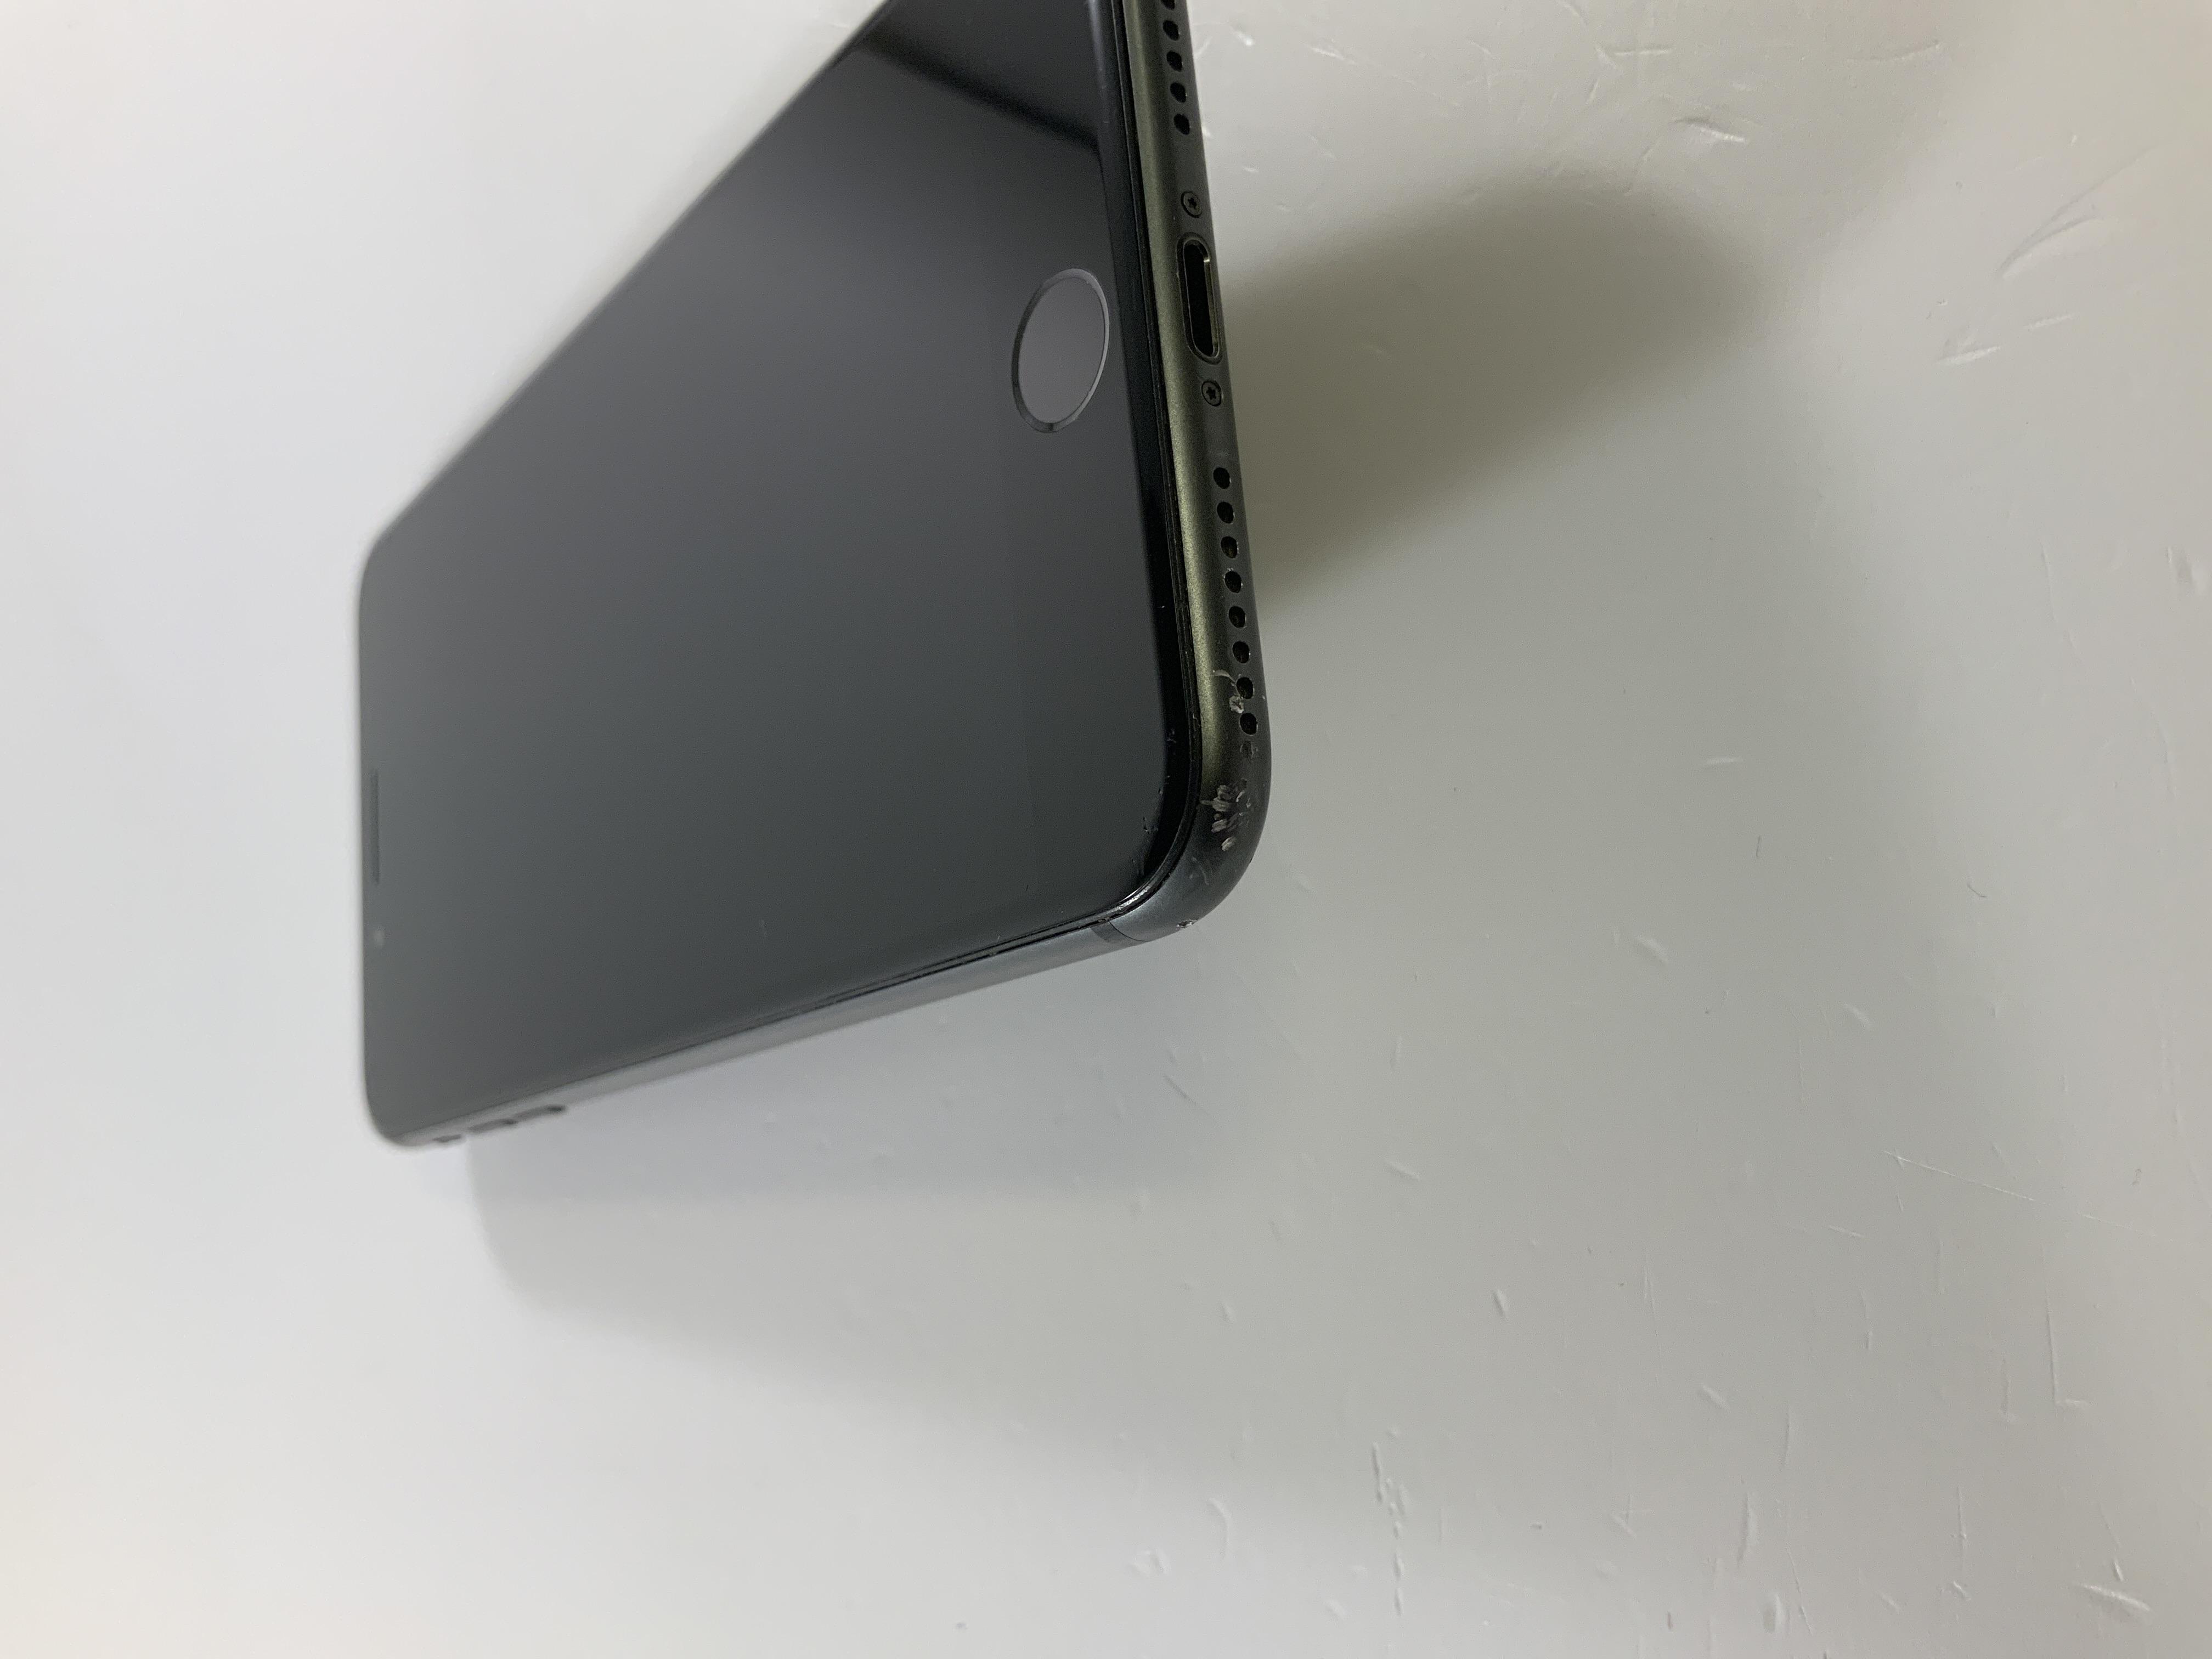 iPhone 8 Plus 64GB, 64GB, Space Gray, Kuva 4